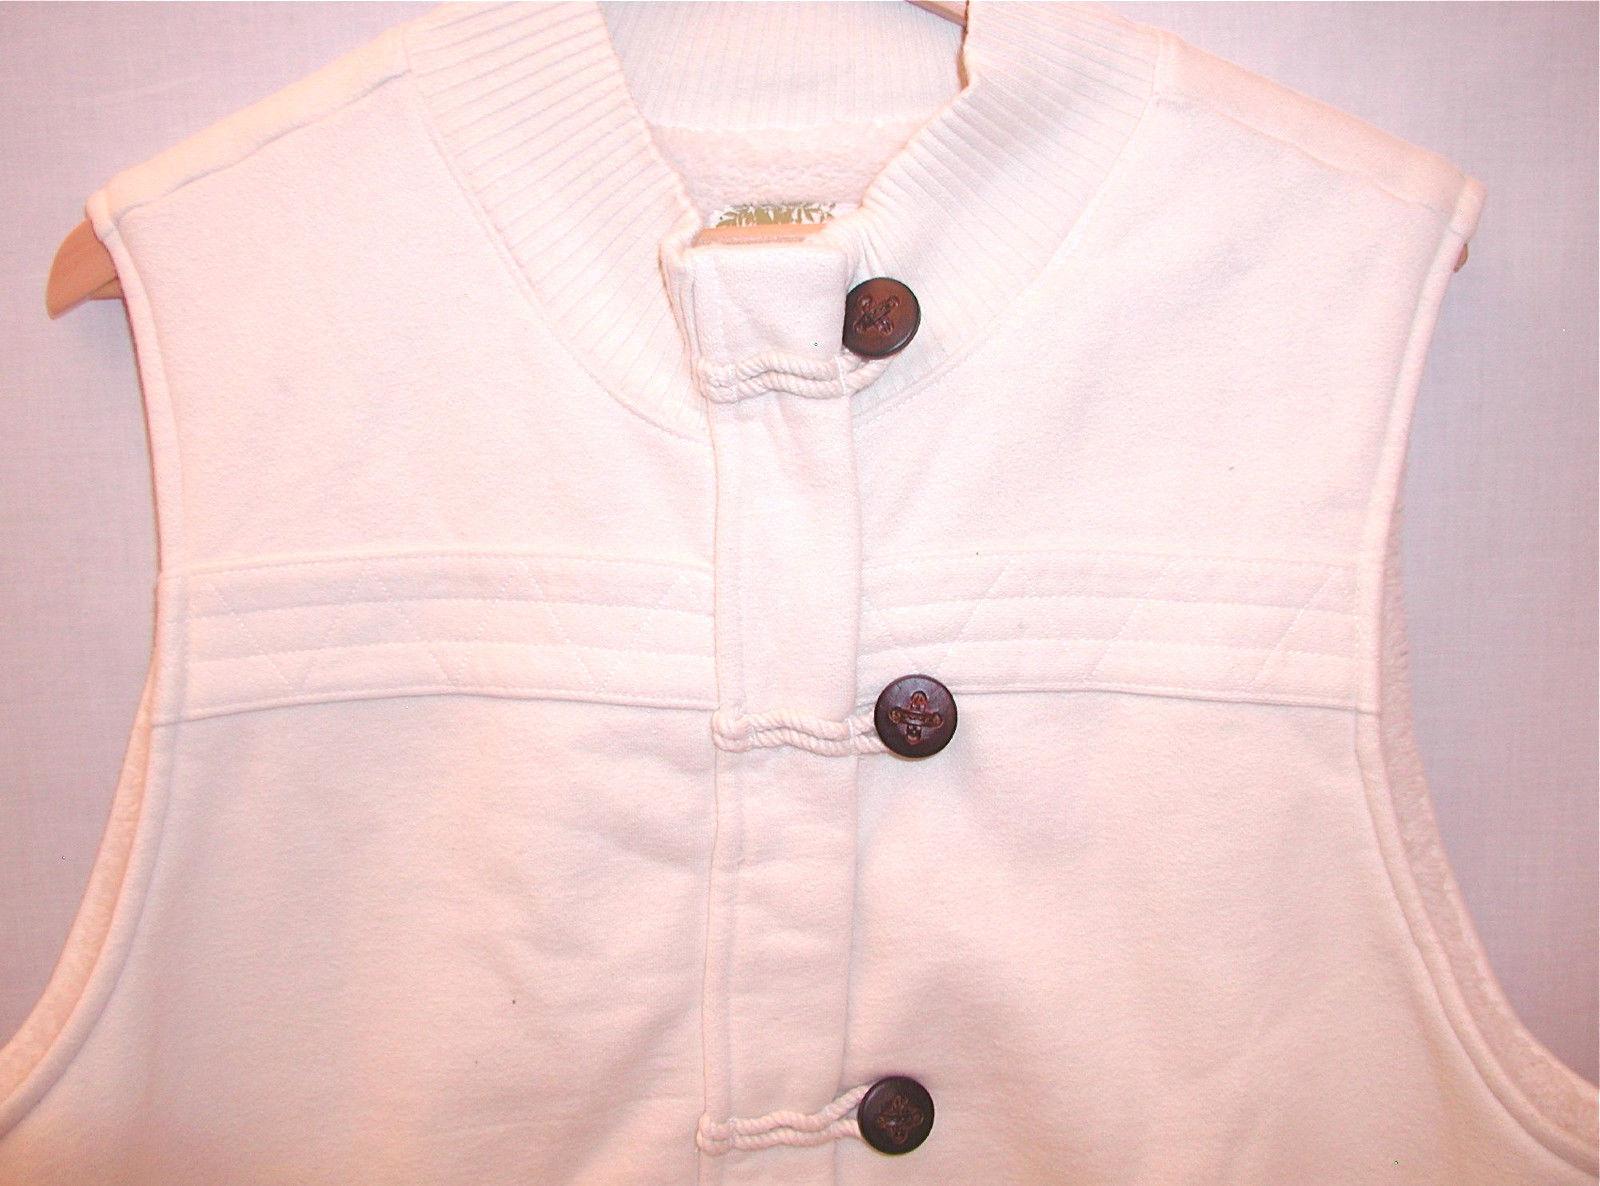 Old Navy Maternity Long Sherpa Cotton Vest Women XXL Cream White Pockets Zipper image 3